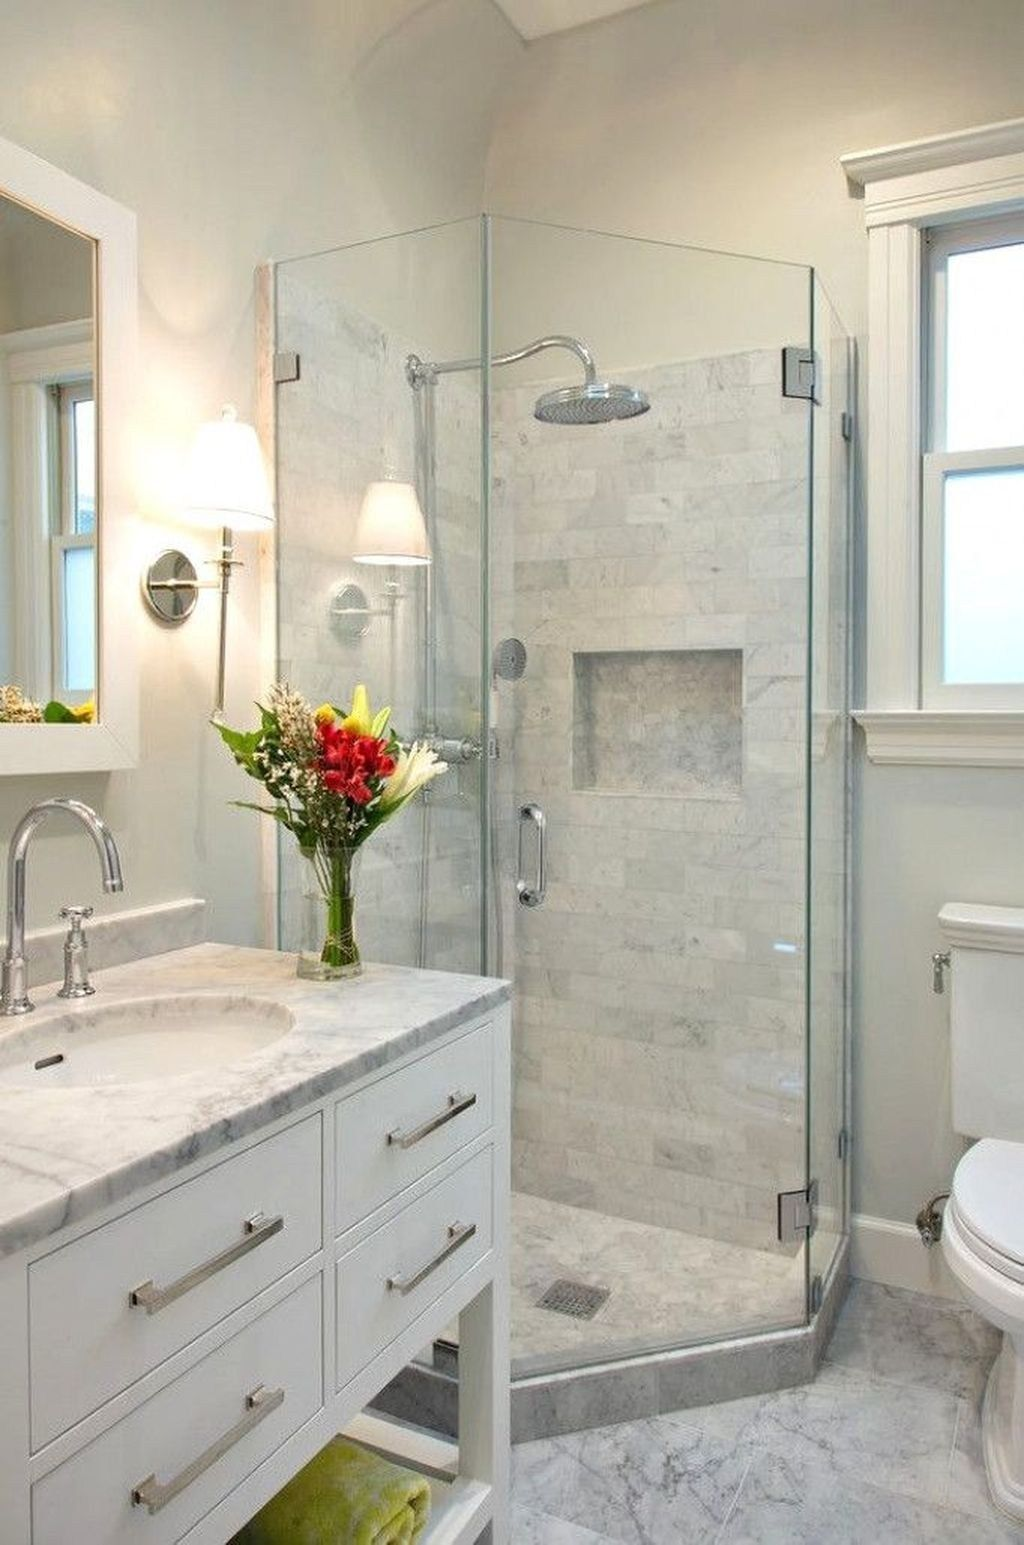 46 Beautiful Master Bathroom Remodel Design Ideas Bathroom Design Small Master Bathroom Shower Small Bathroom